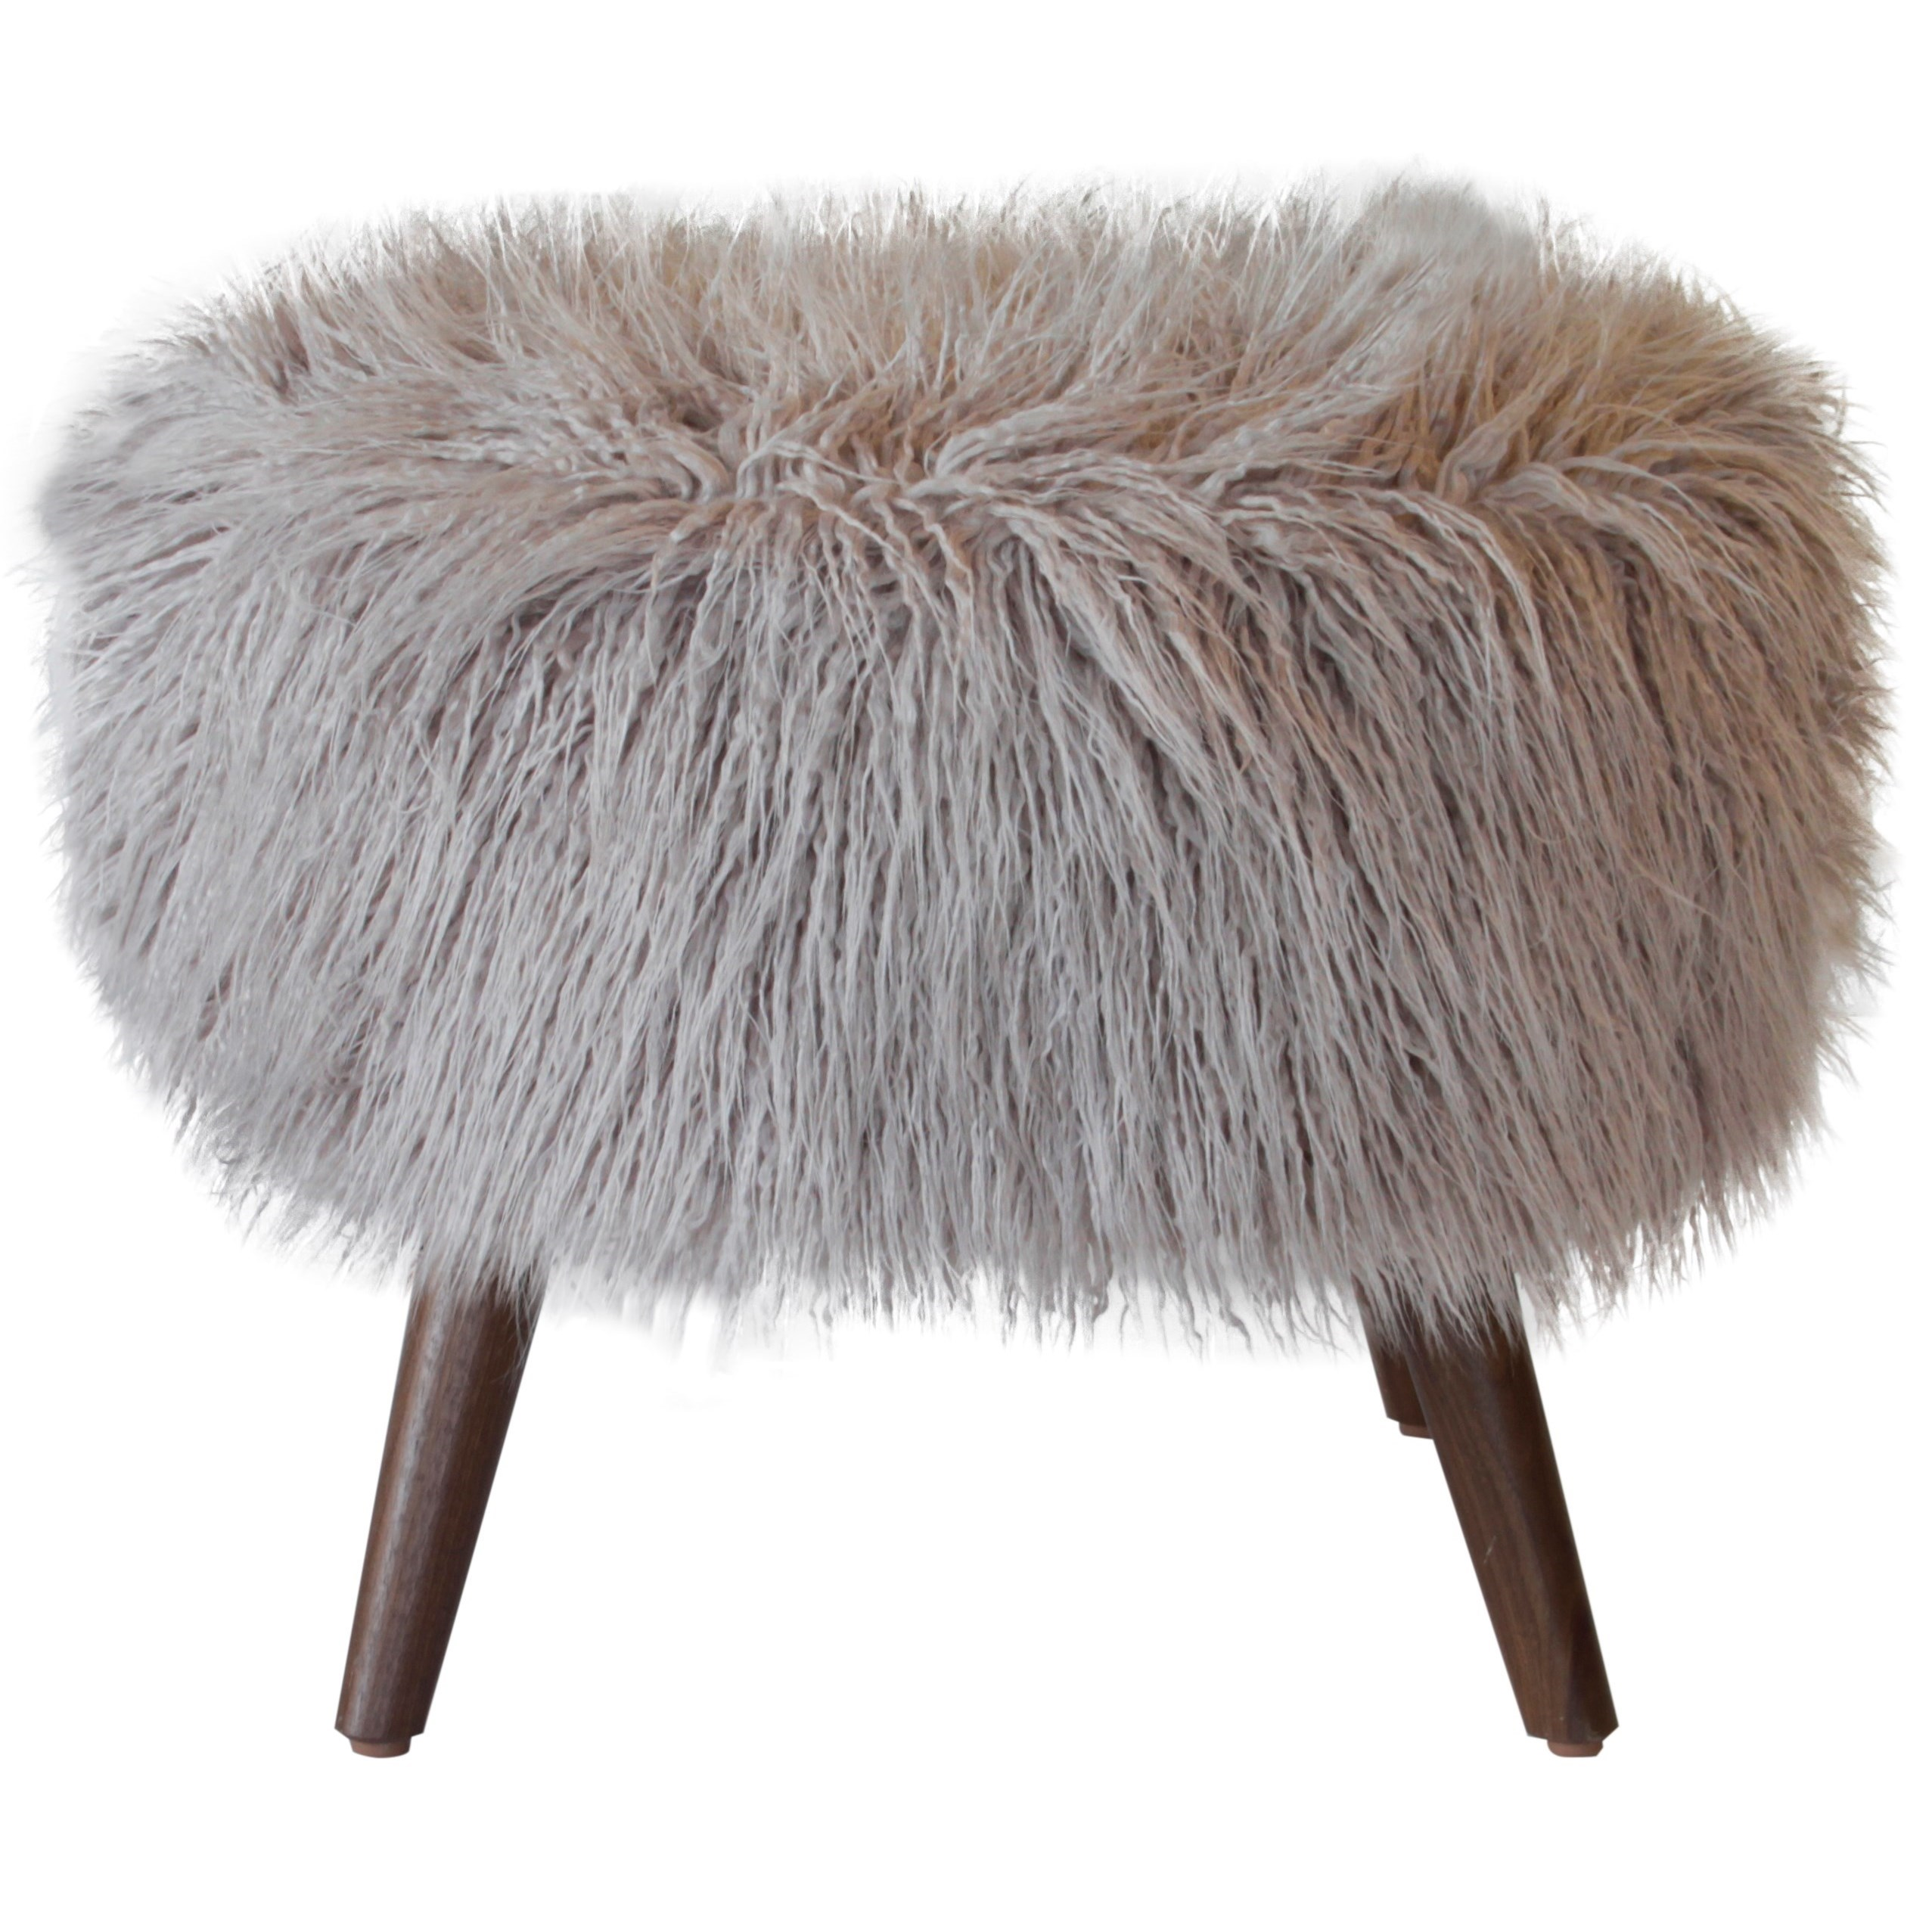 Bibi Accent Footstool by Jonathan Louis at HomeWorld Furniture